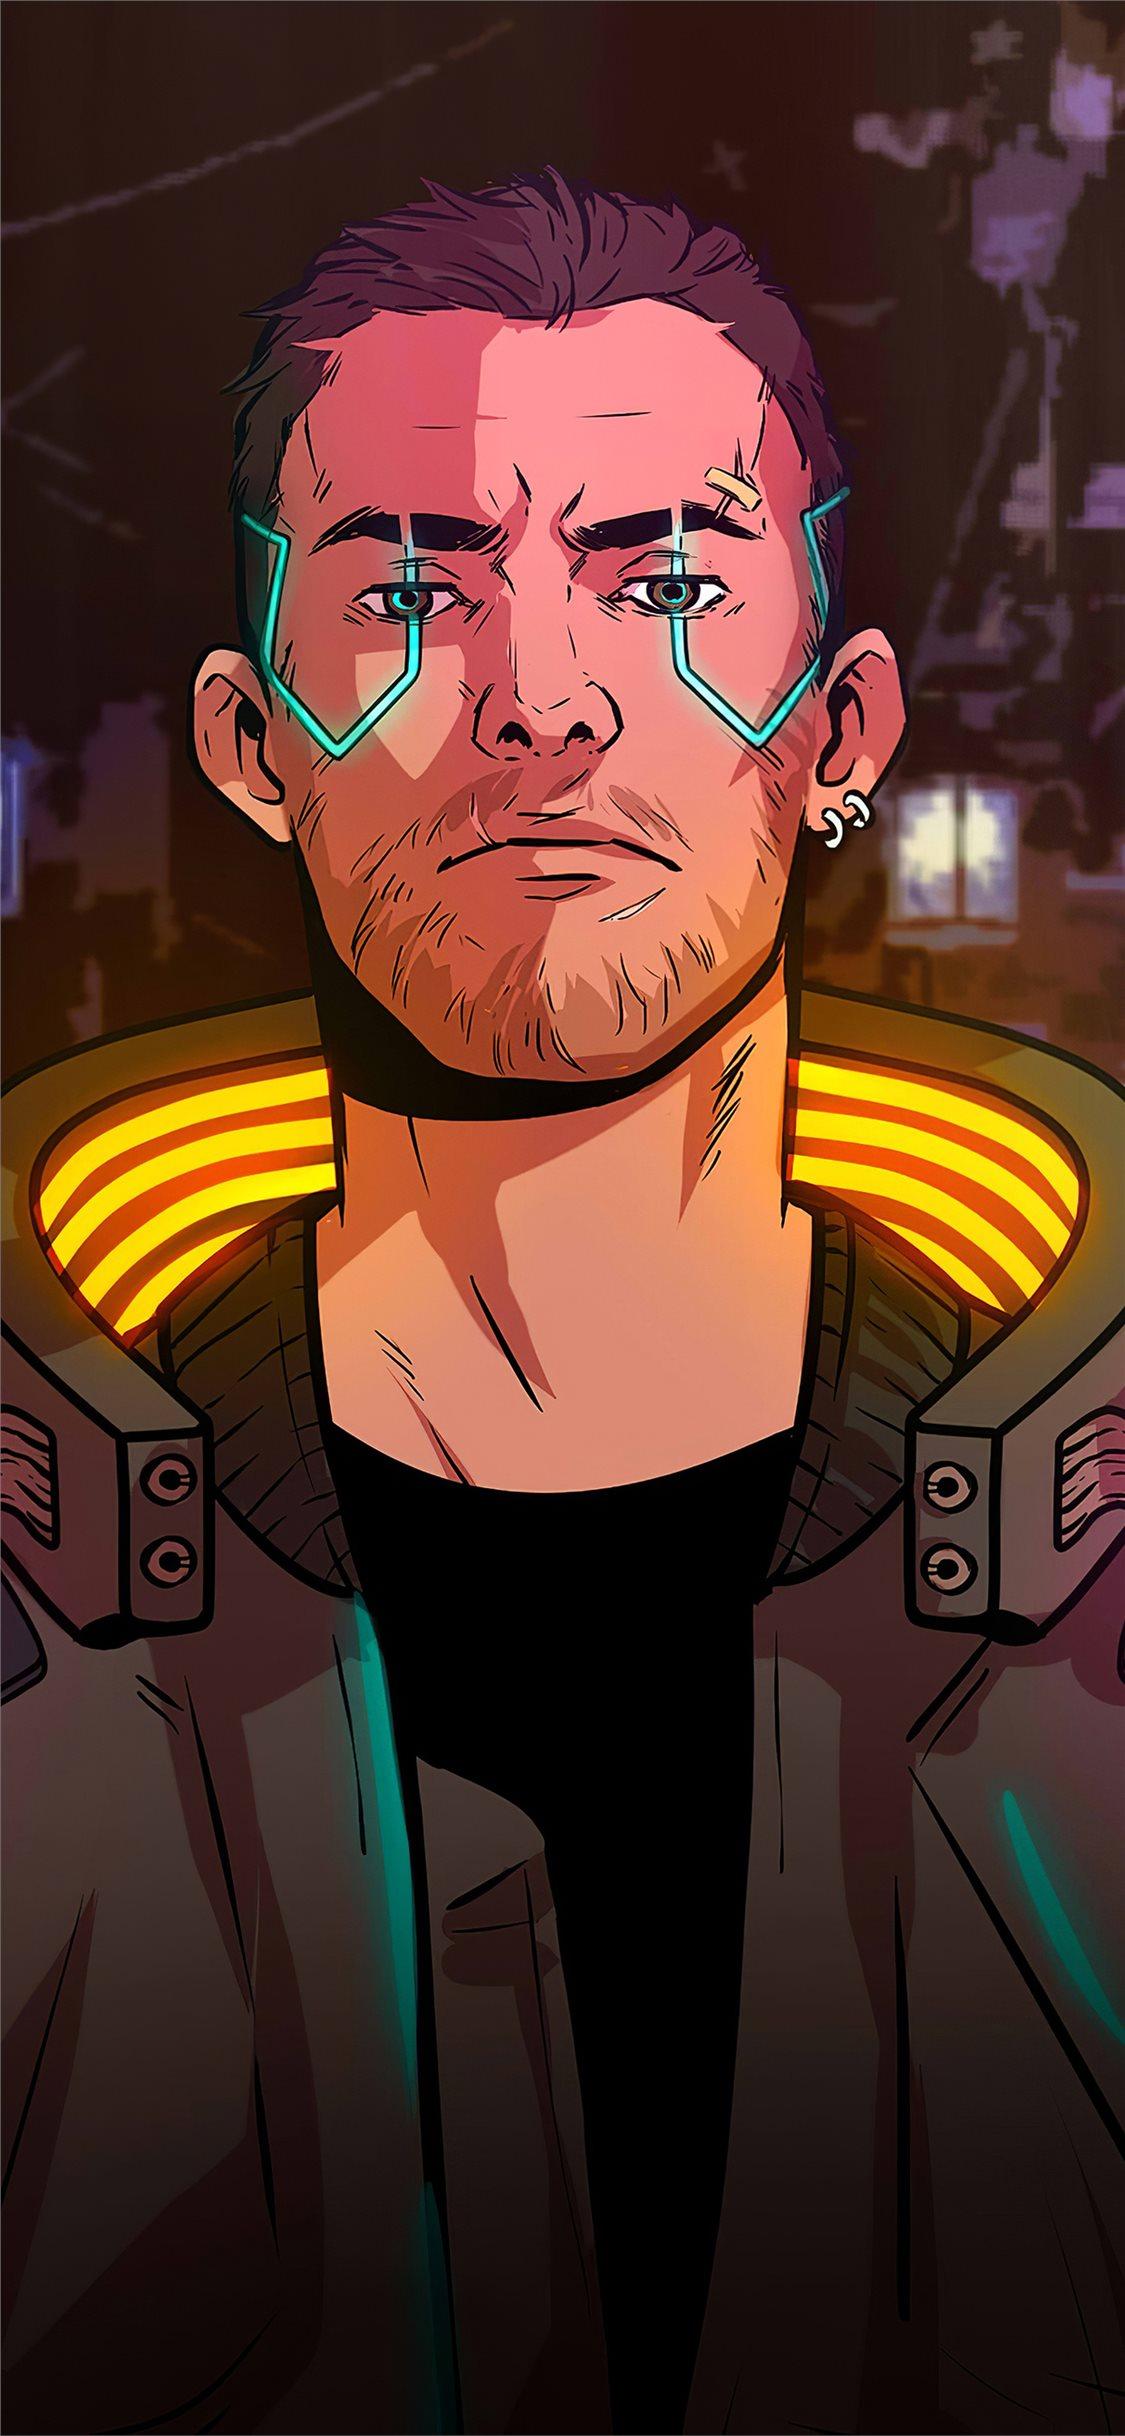 Cyberpunk 2077 Boy 5k Iphone X Wallpapers Free Download